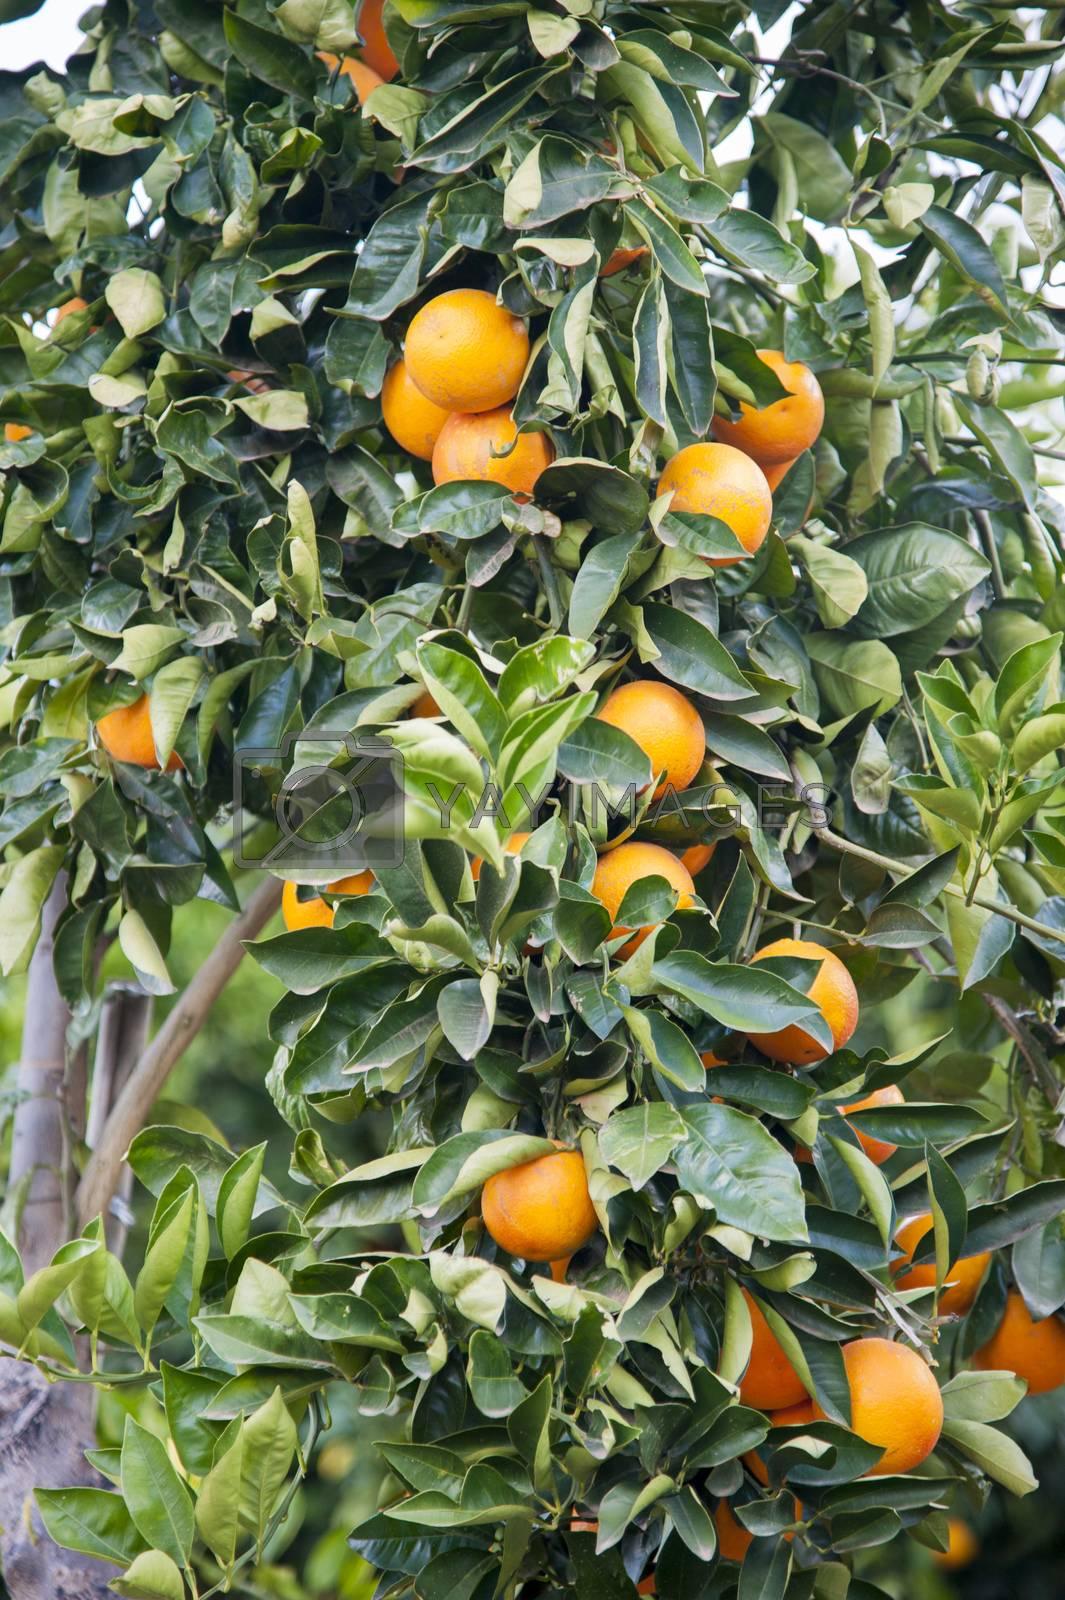 Tree growing fresh oranges